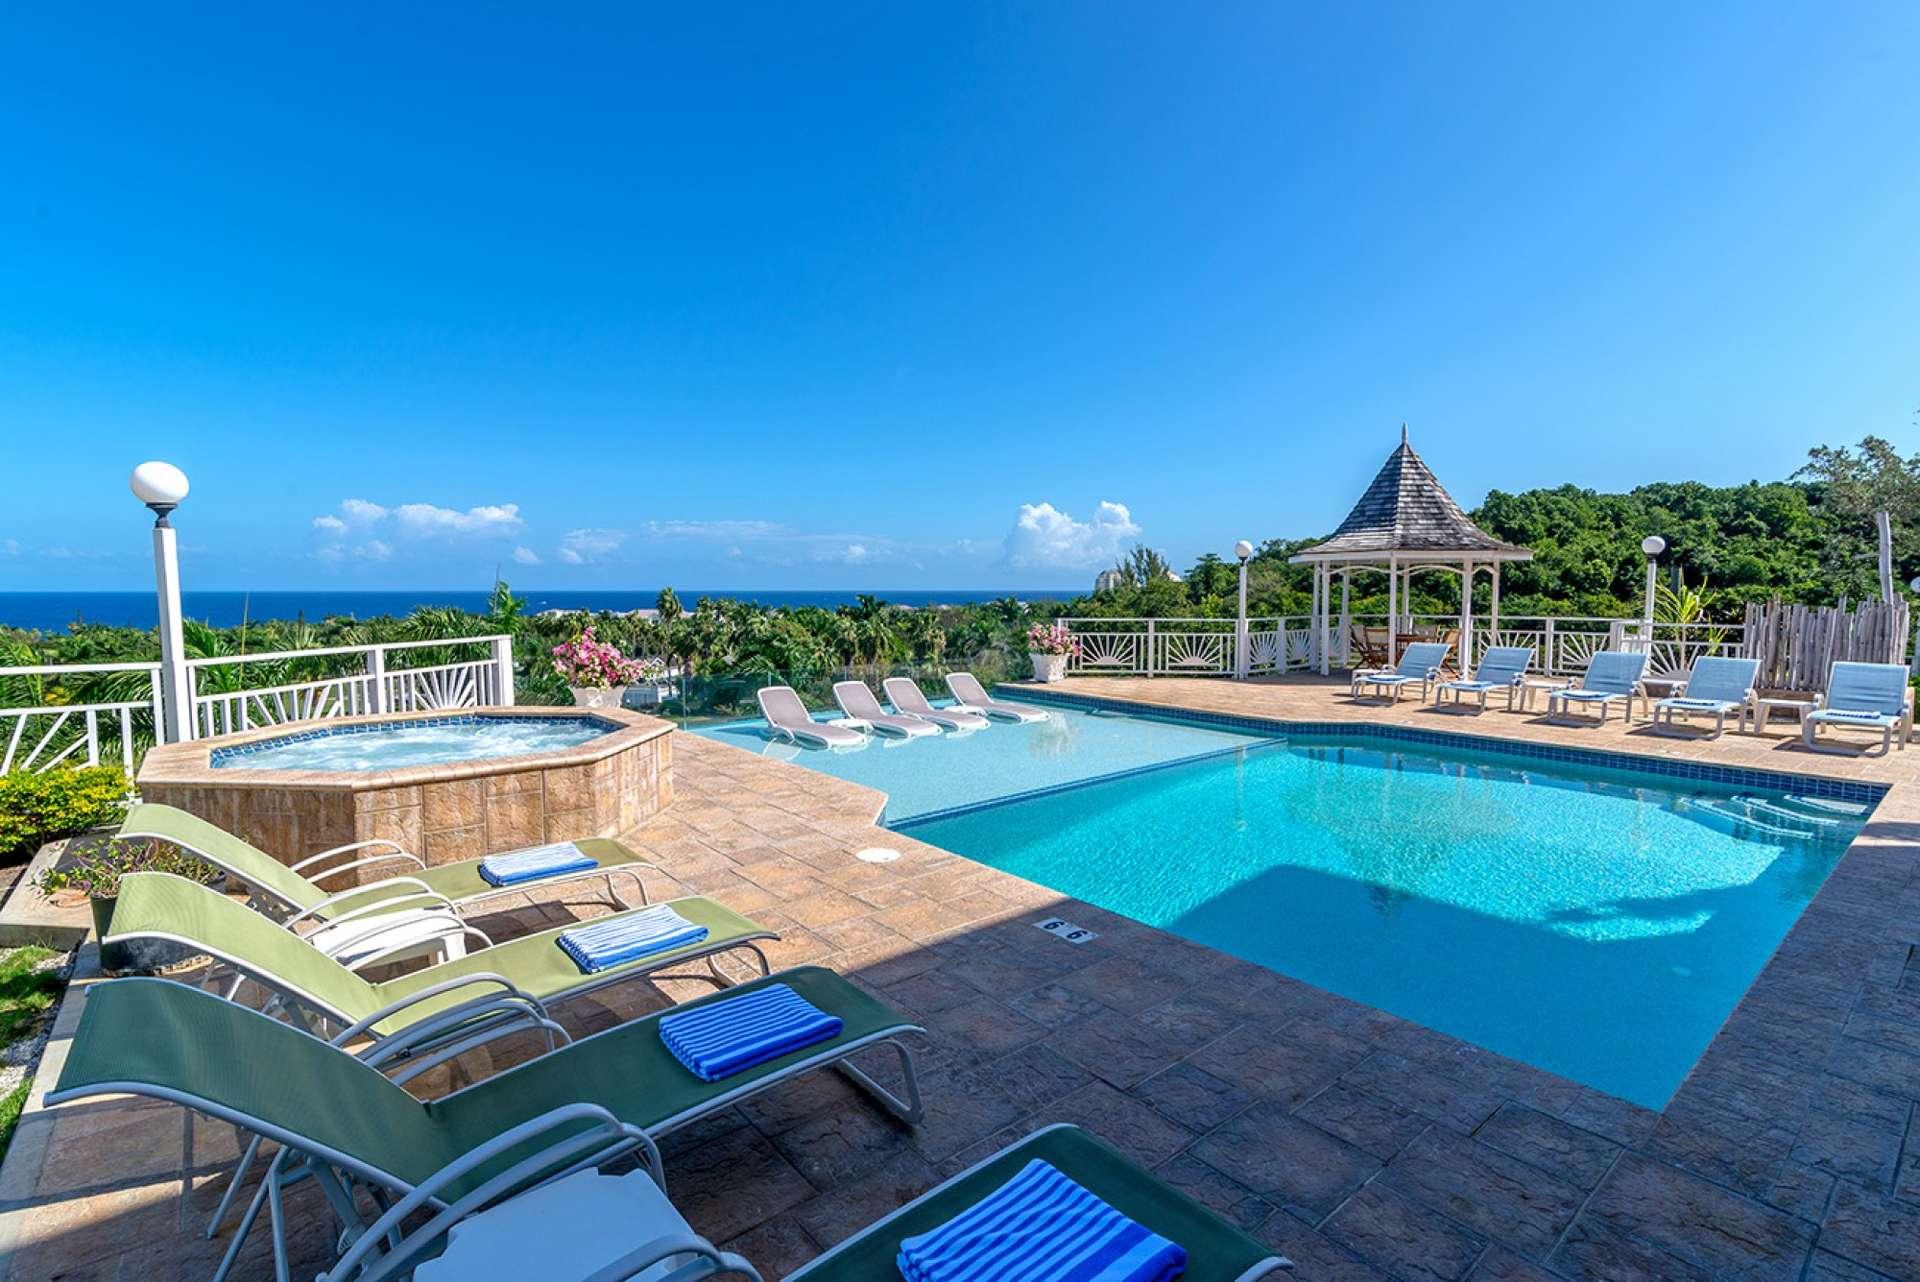 Luxury villa rentals caribbean - Jamaica - Montego bay - Fairway Manor - Image 1/25